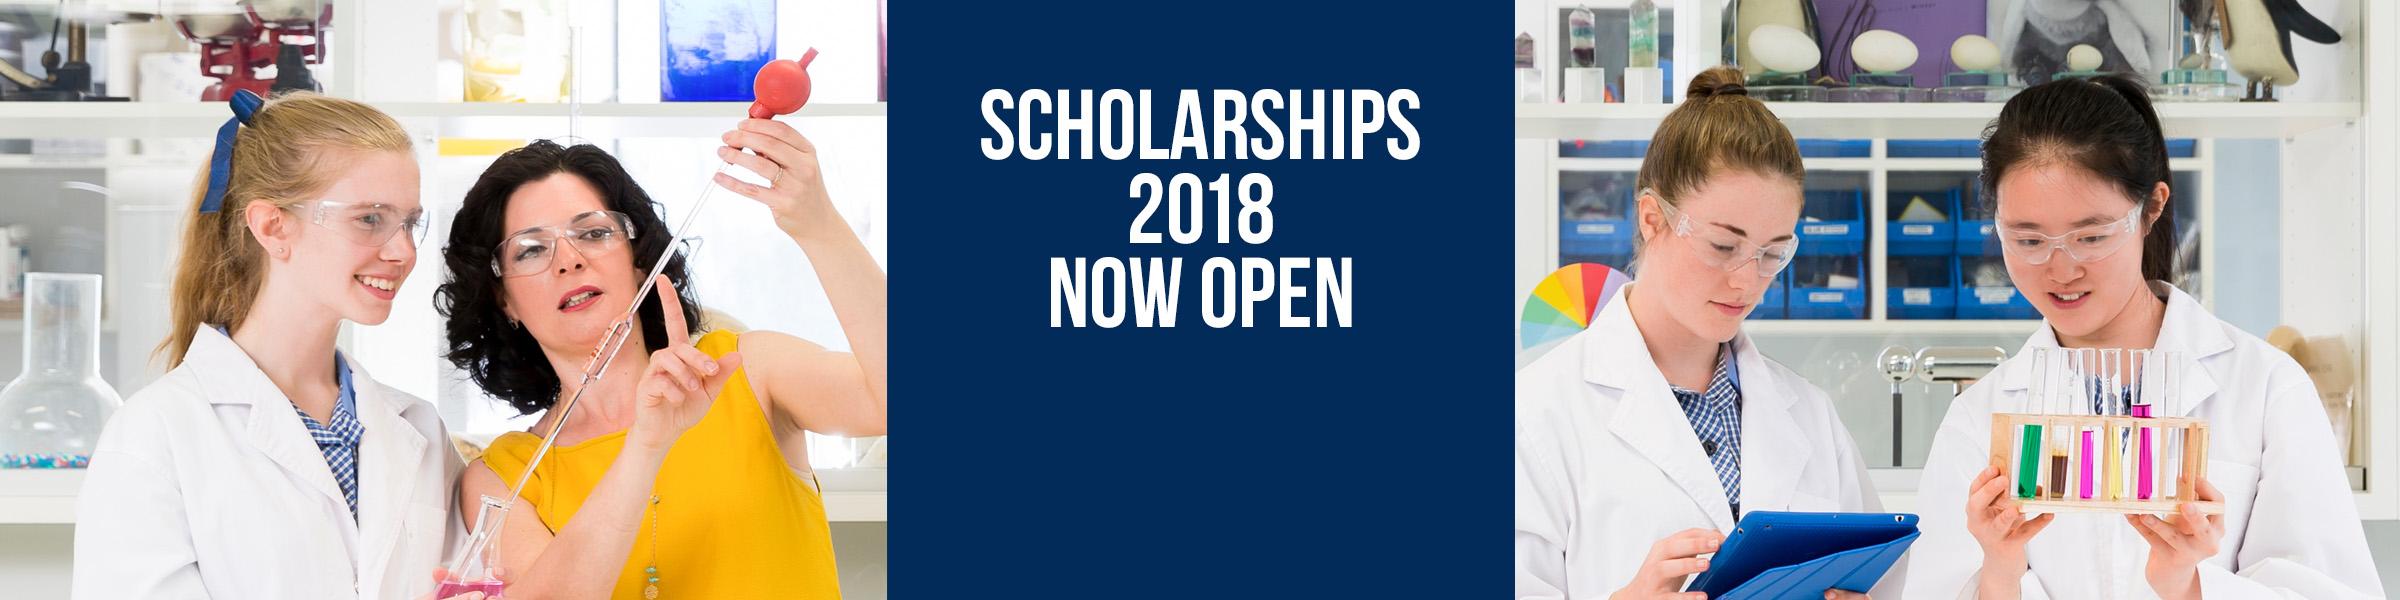 cggs_homepage_2400x600_scholarships